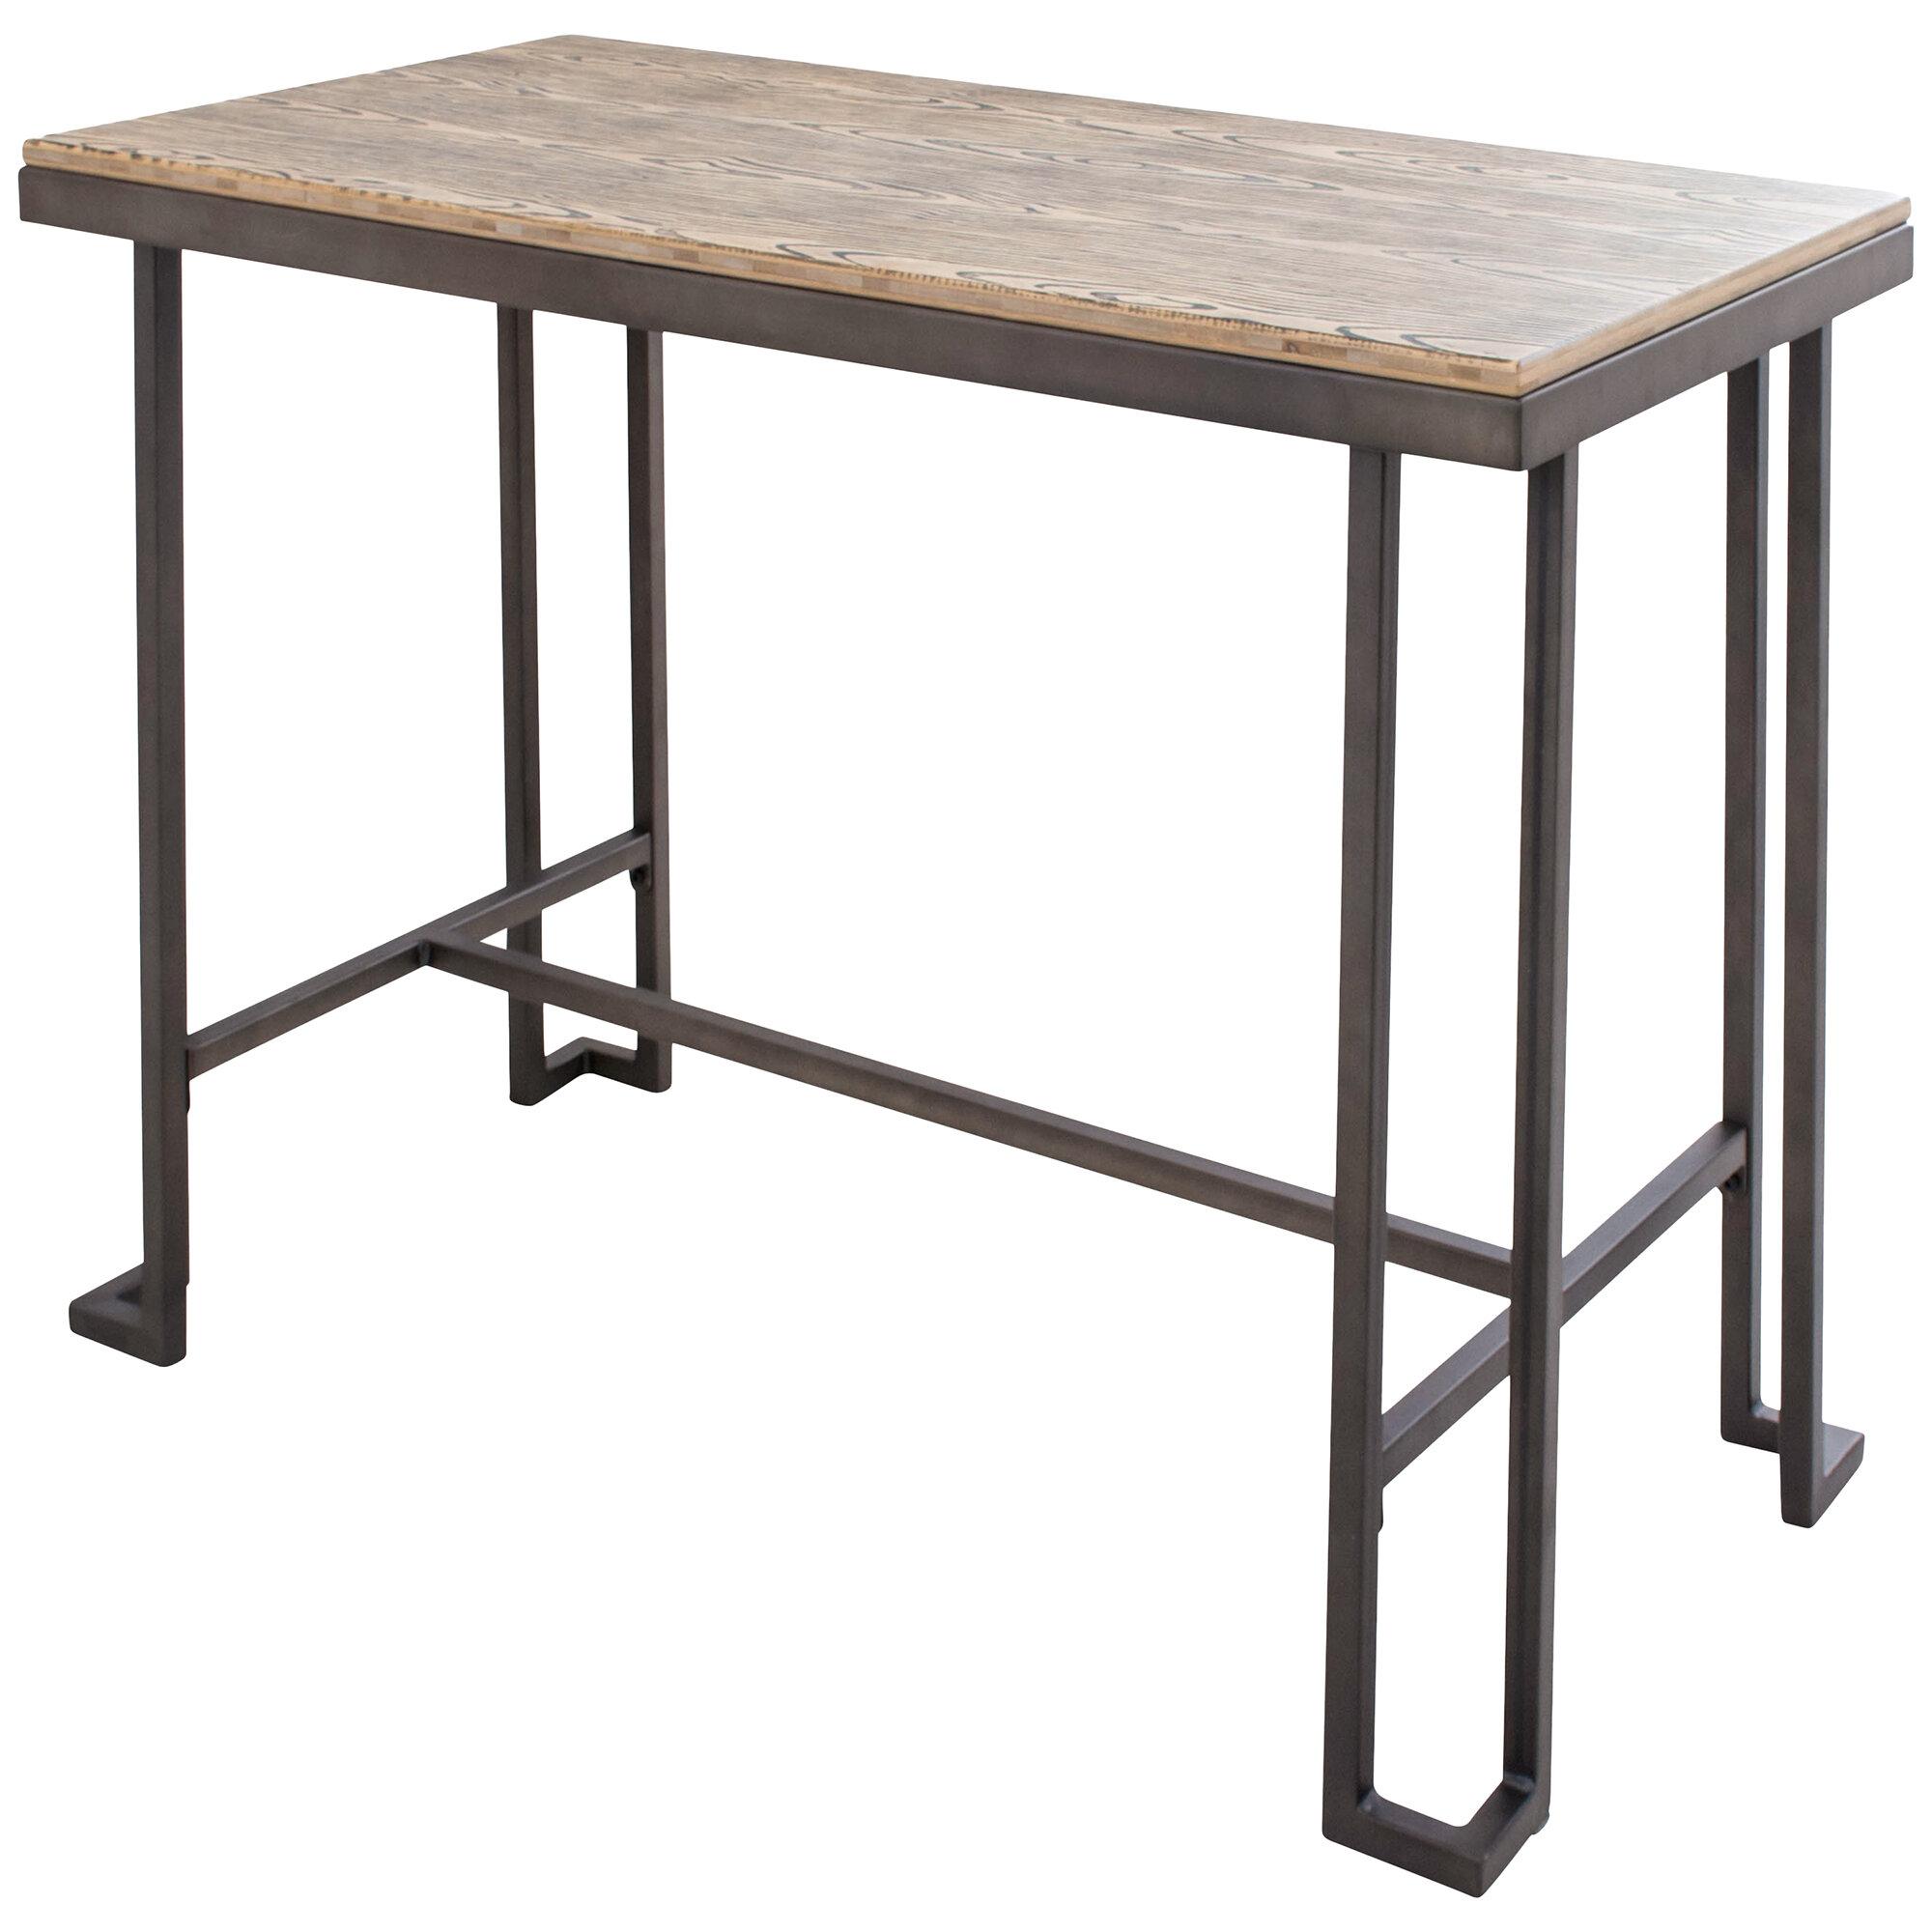 Strange Calistoga Counter Height Dining Table Machost Co Dining Chair Design Ideas Machostcouk